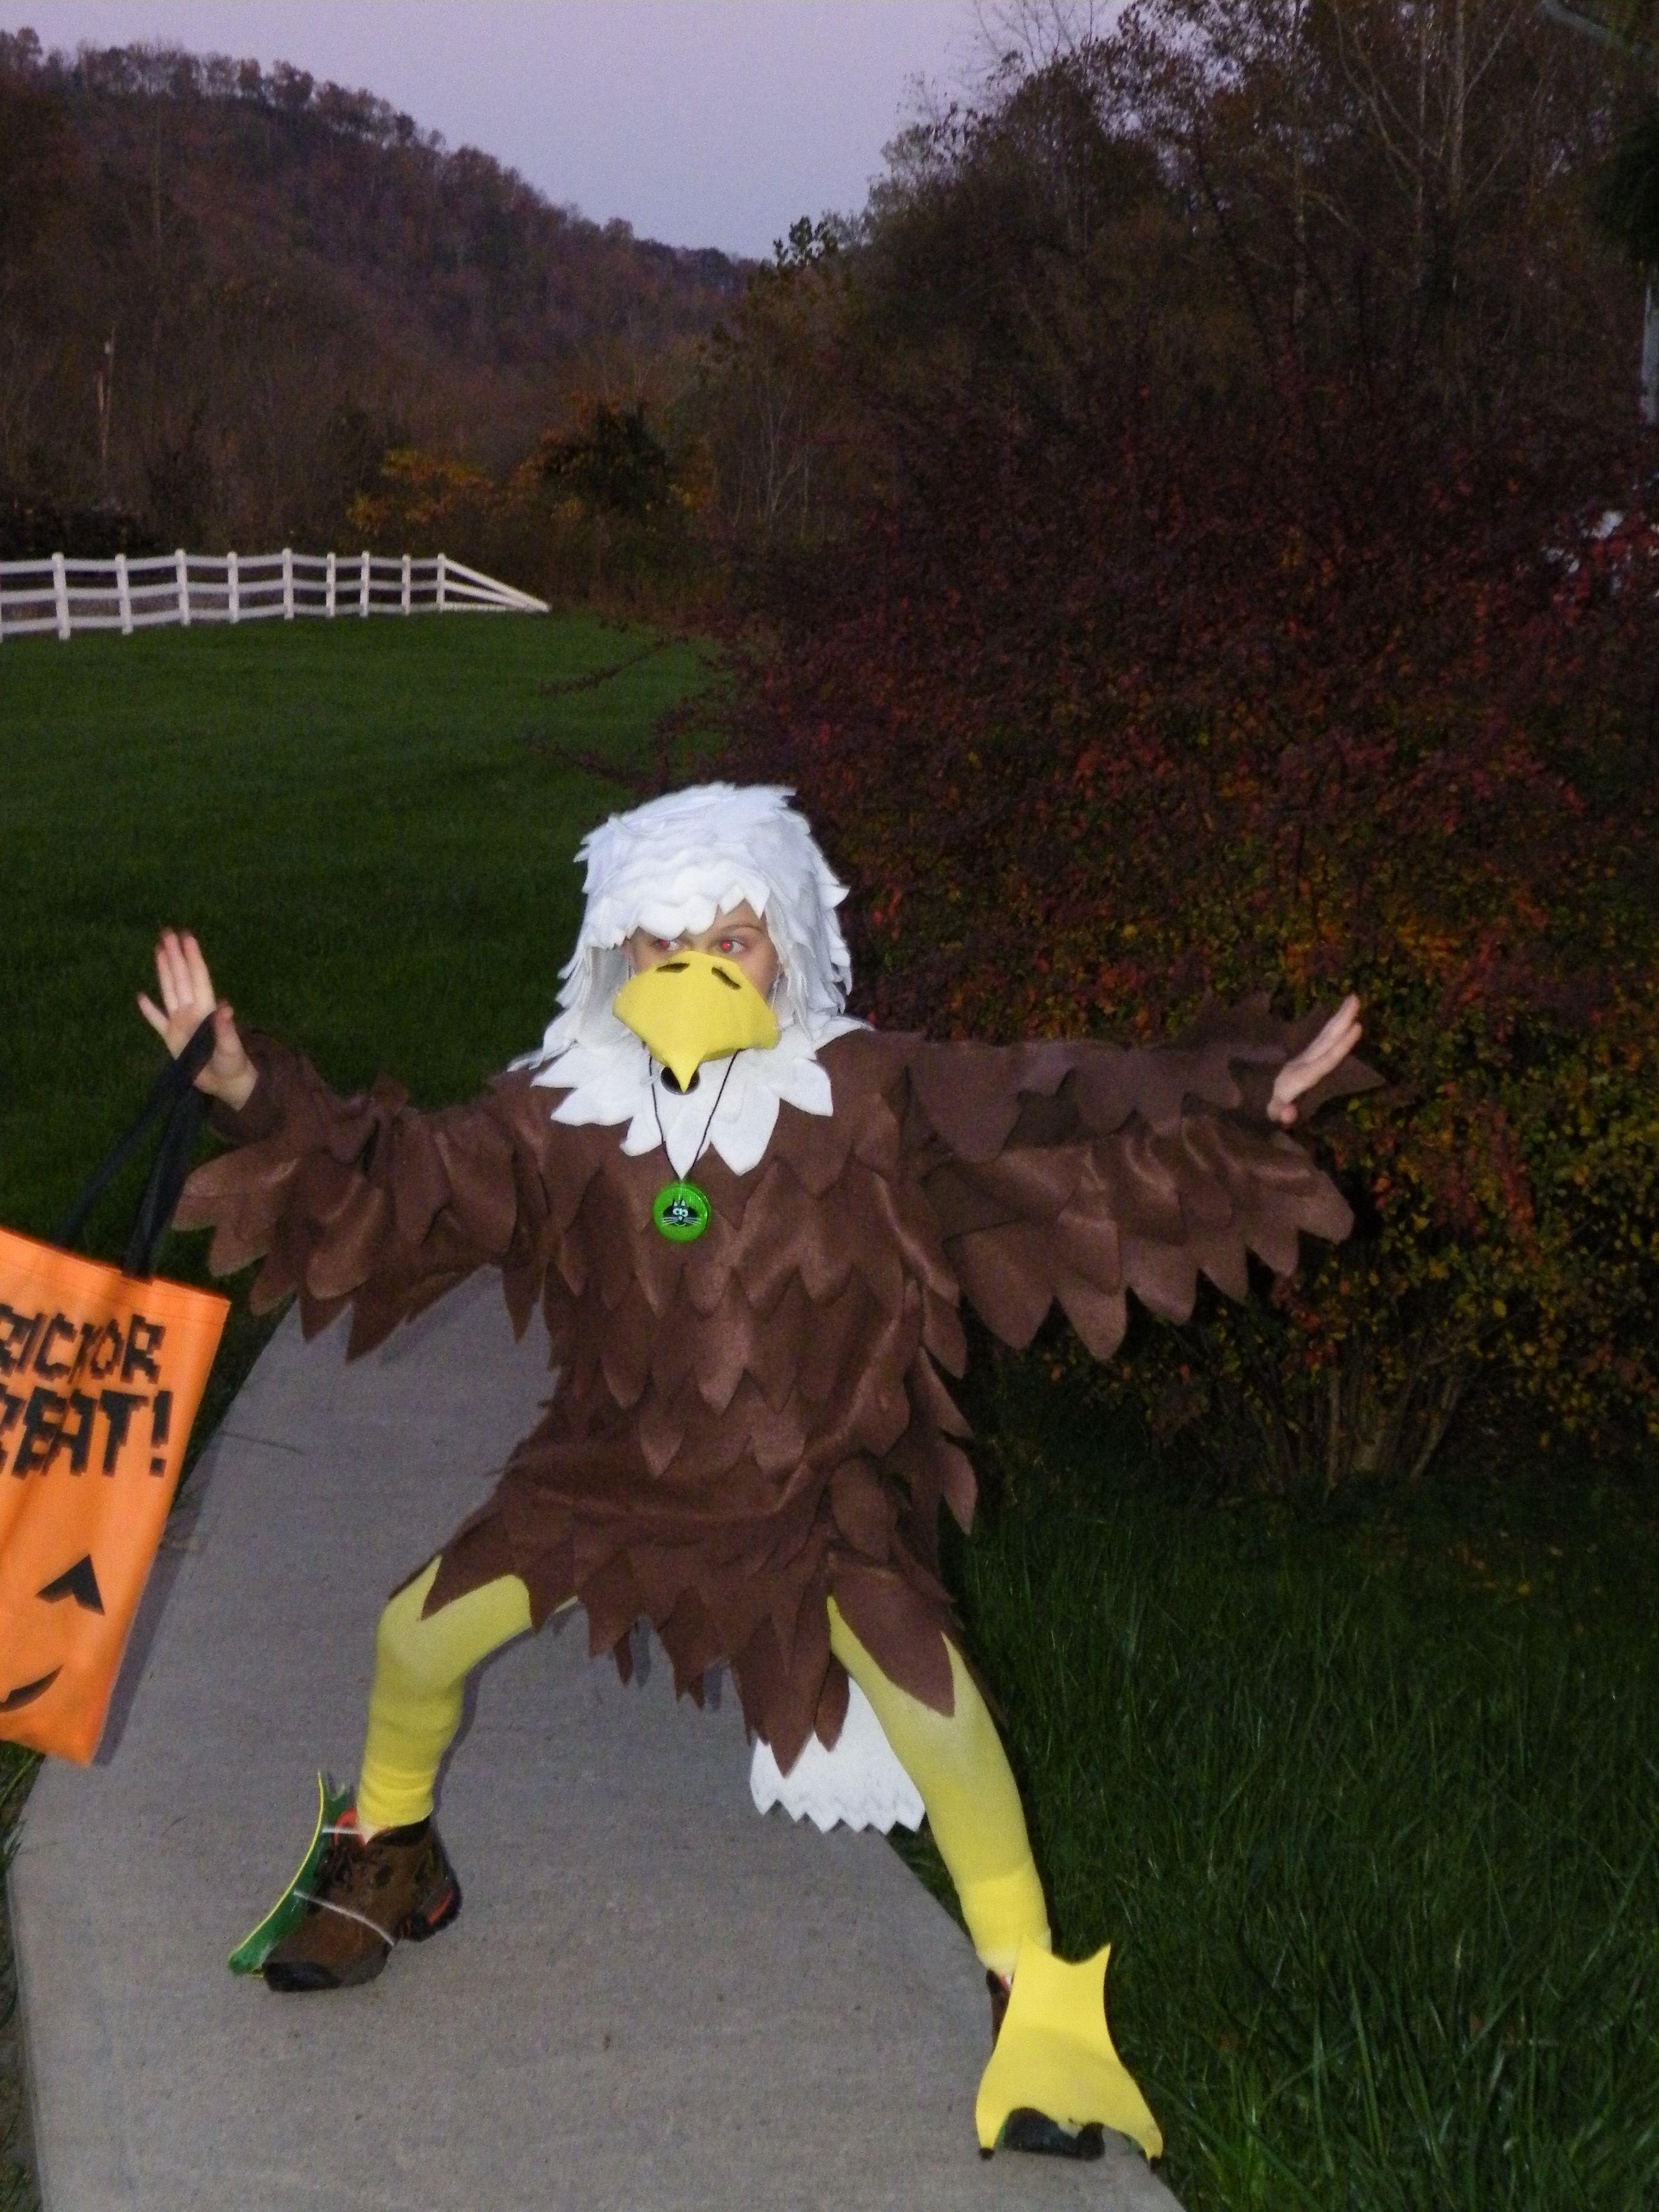 Bald Eagle Costume | Halloween costume contest, Homemade costumes ...